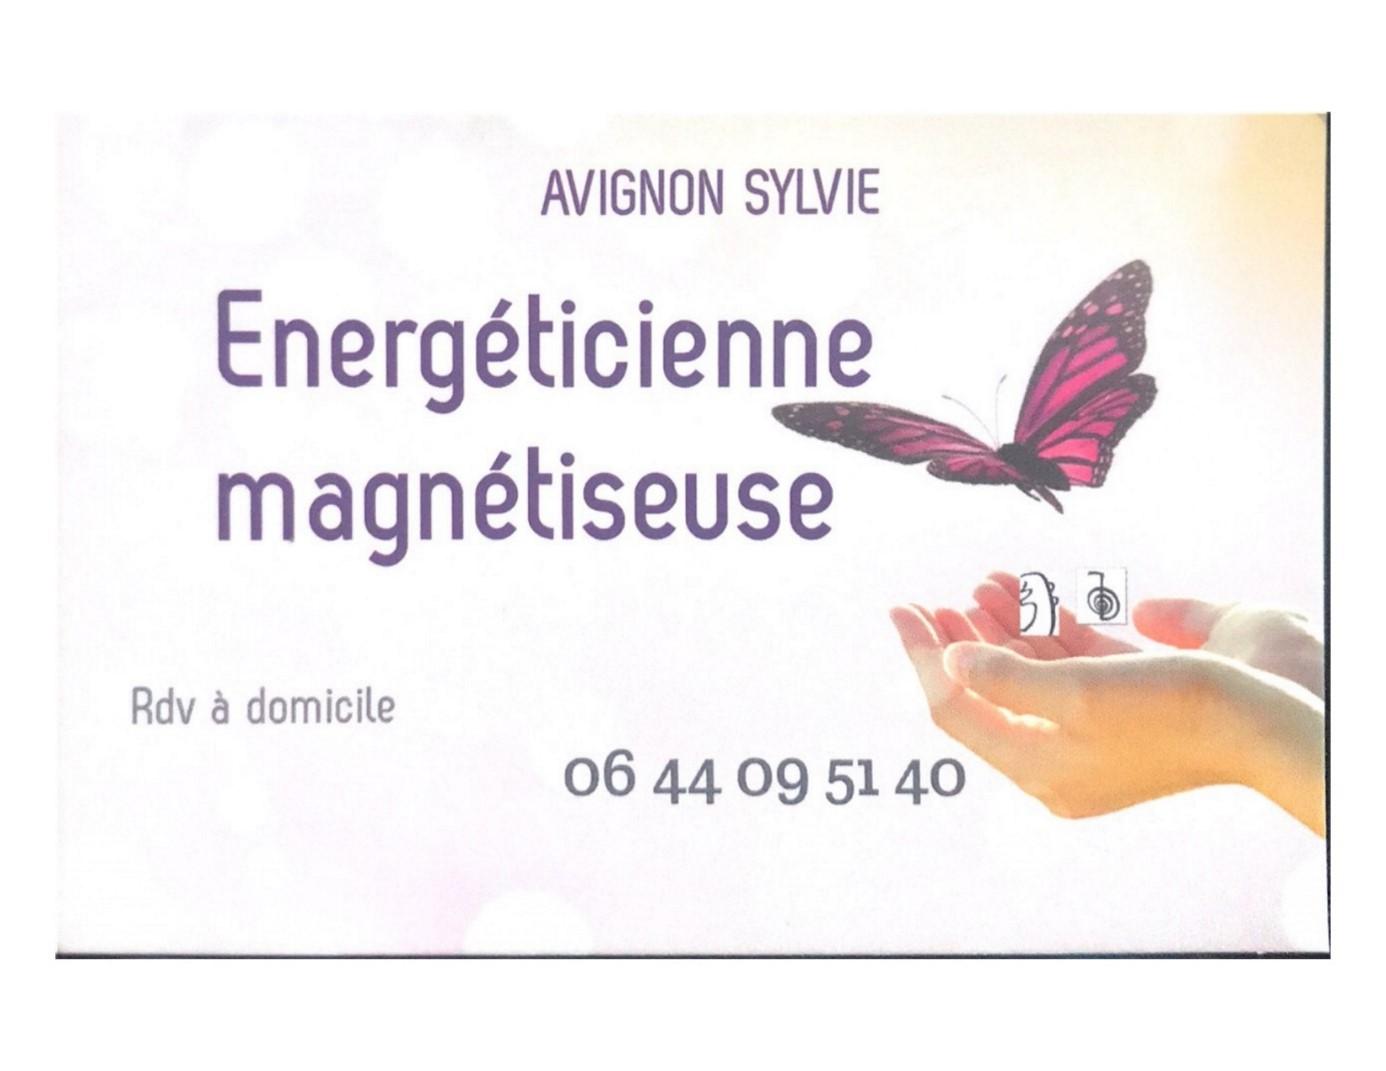 Énergéticienne Magnétiseuse et Radiesthésiste